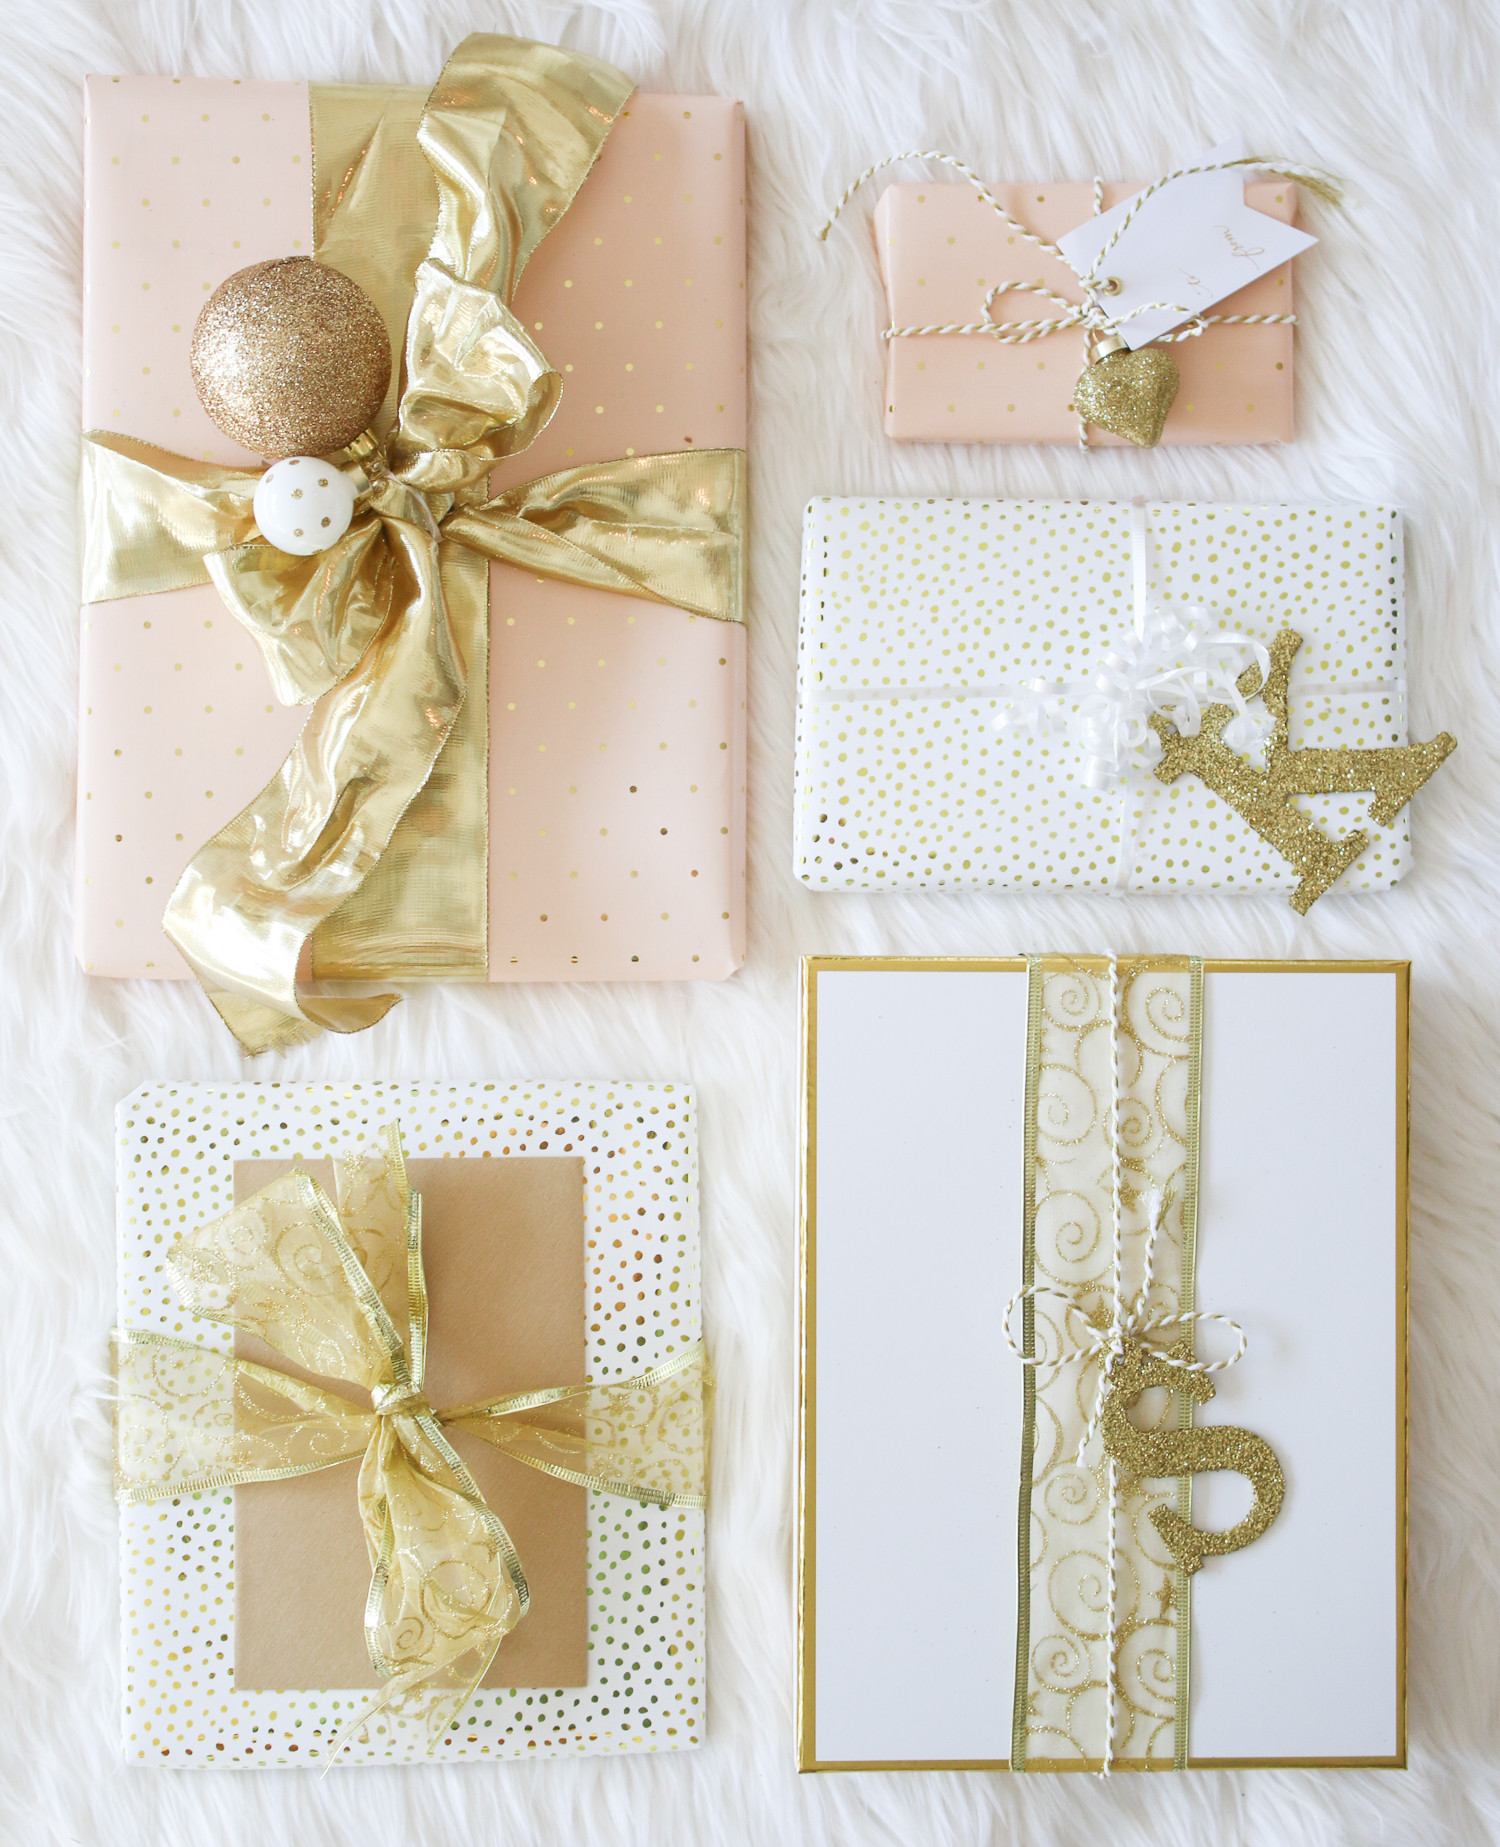 Christmas Gift Wrapping Ideas Elegant  Elegant Holiday Gift Wrap Ideas